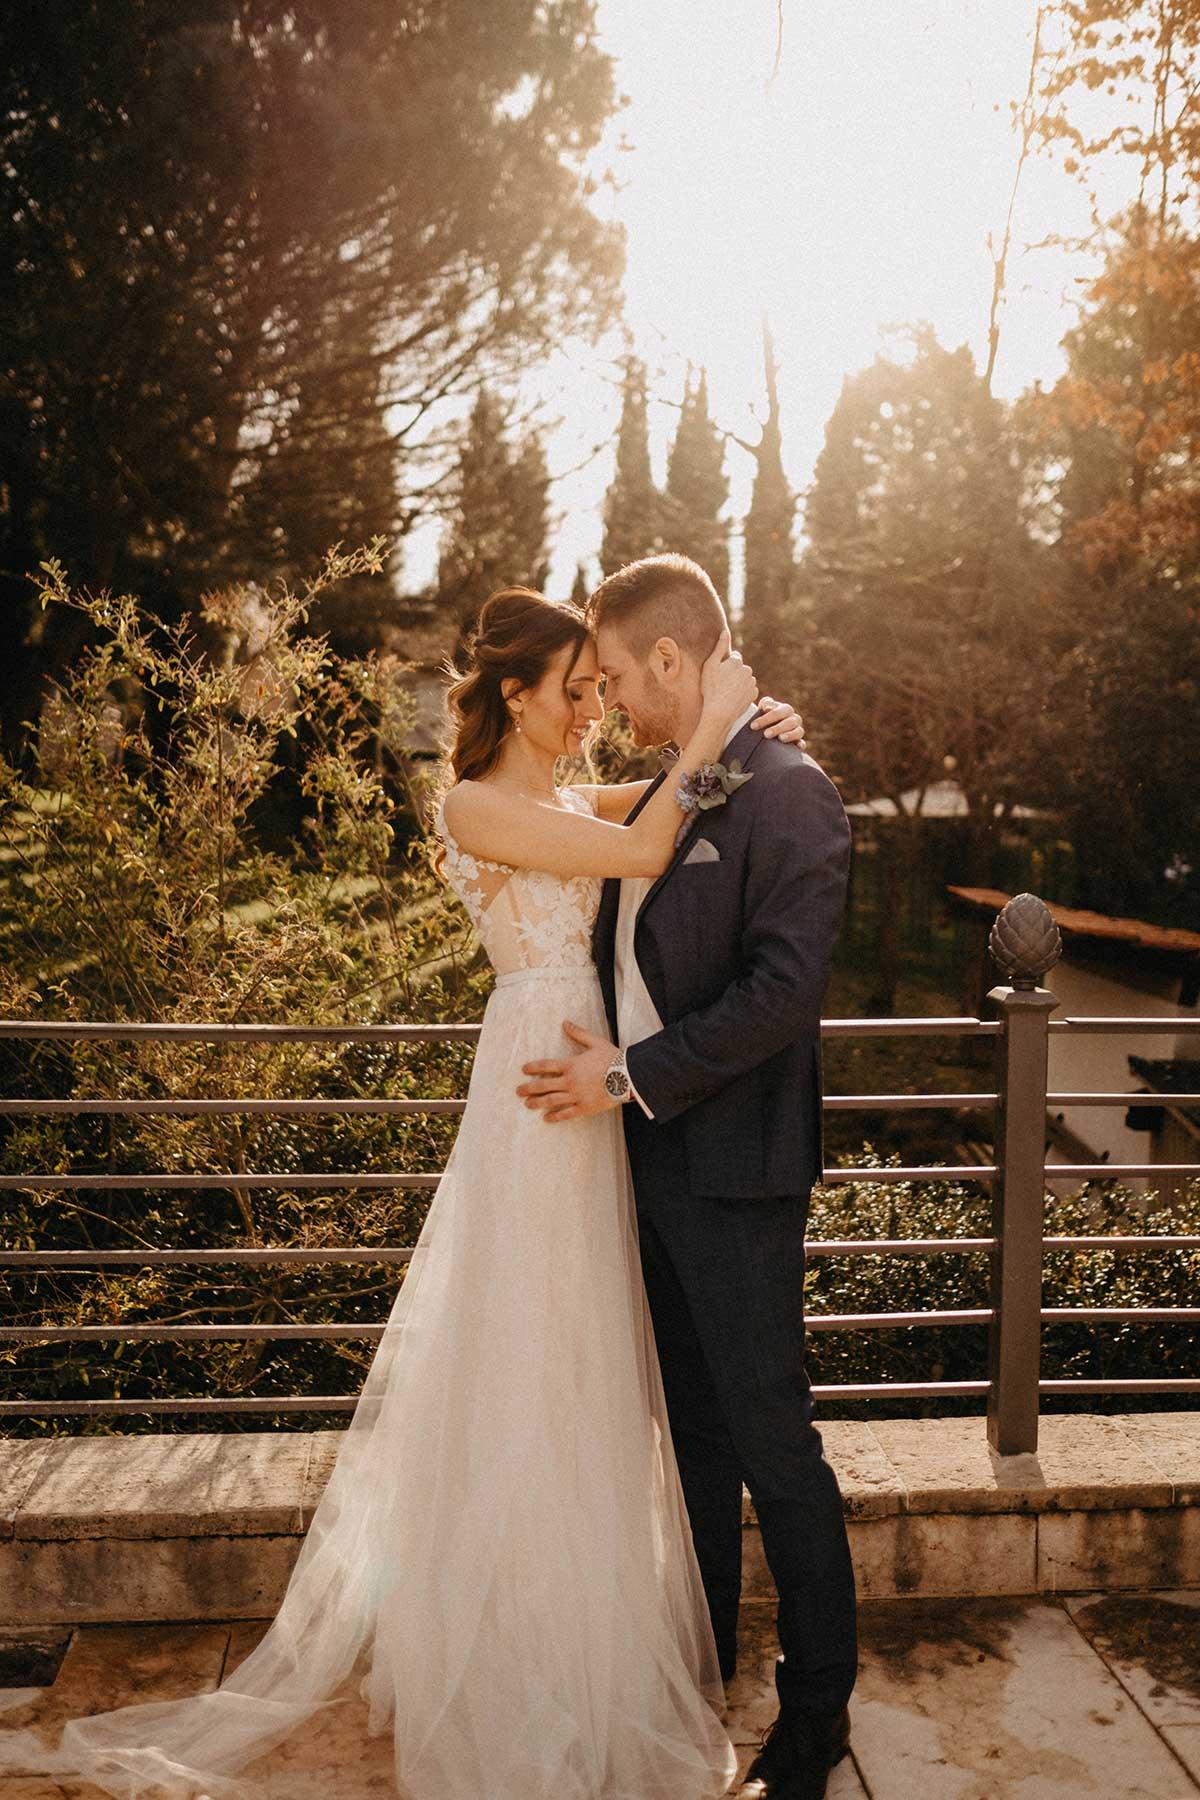 Brautpaar beim Paar Fotoshooting